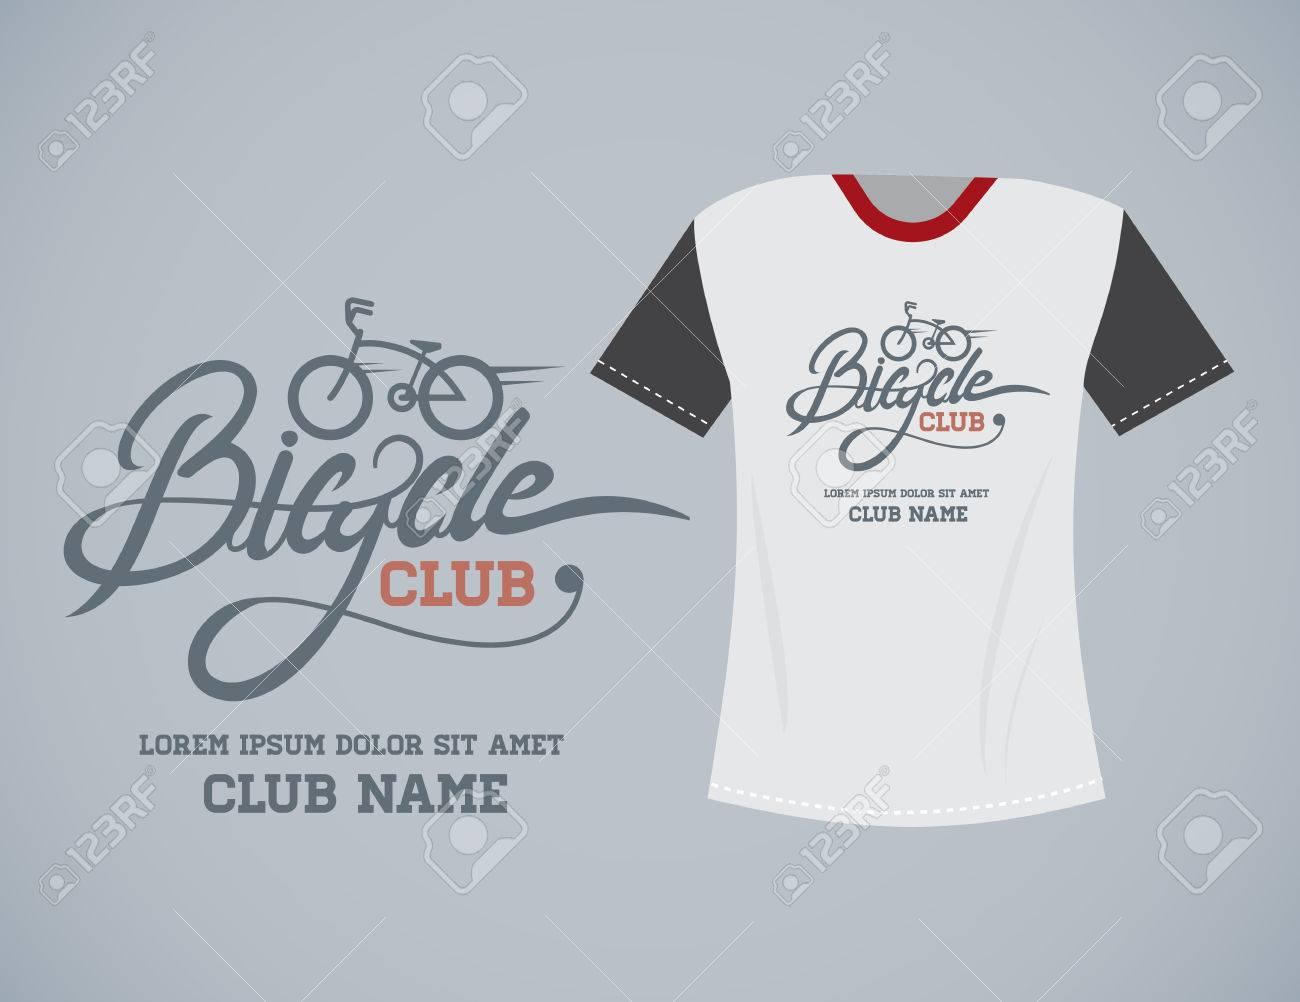 Shirt ke design - Ke Typography On T Shirts Creative Design Stock Vector 43272760